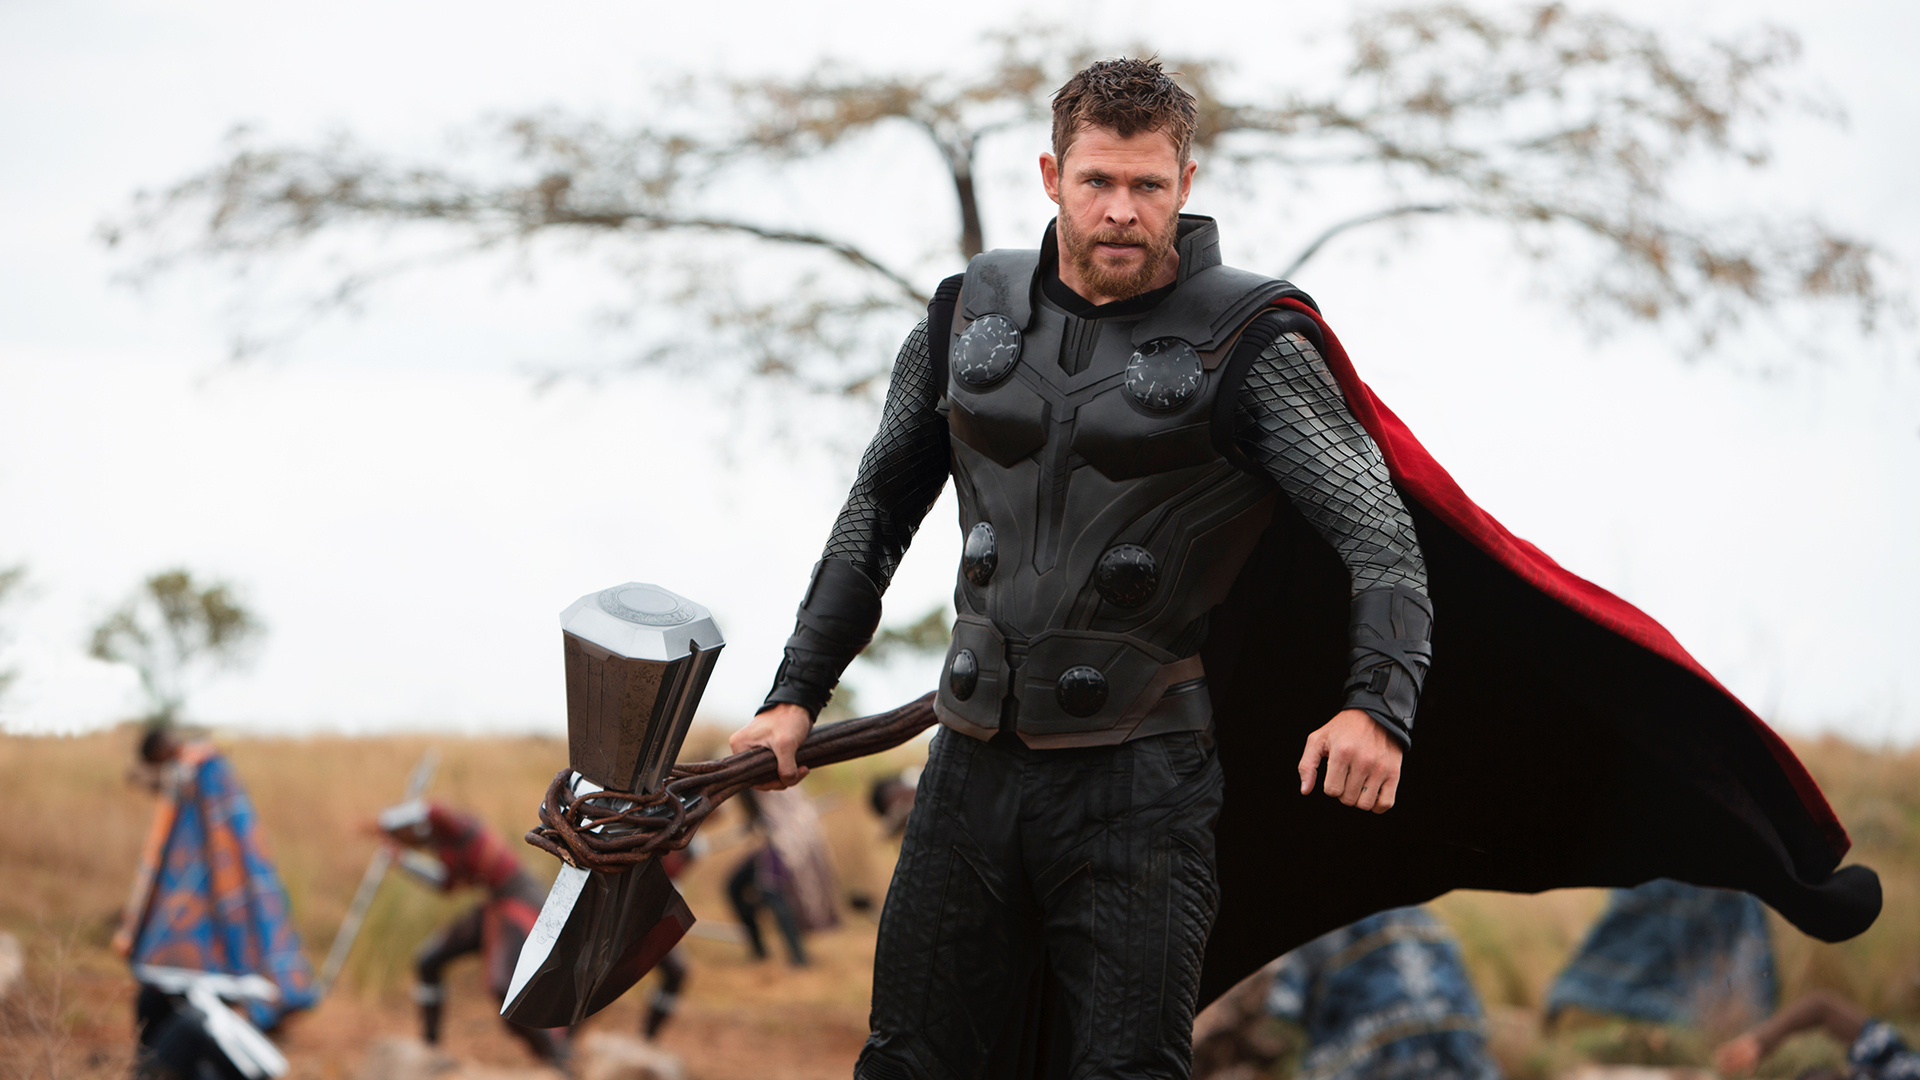 1920x1080 Thor Avengers Infinity War Laptop Full HD 1080P ...